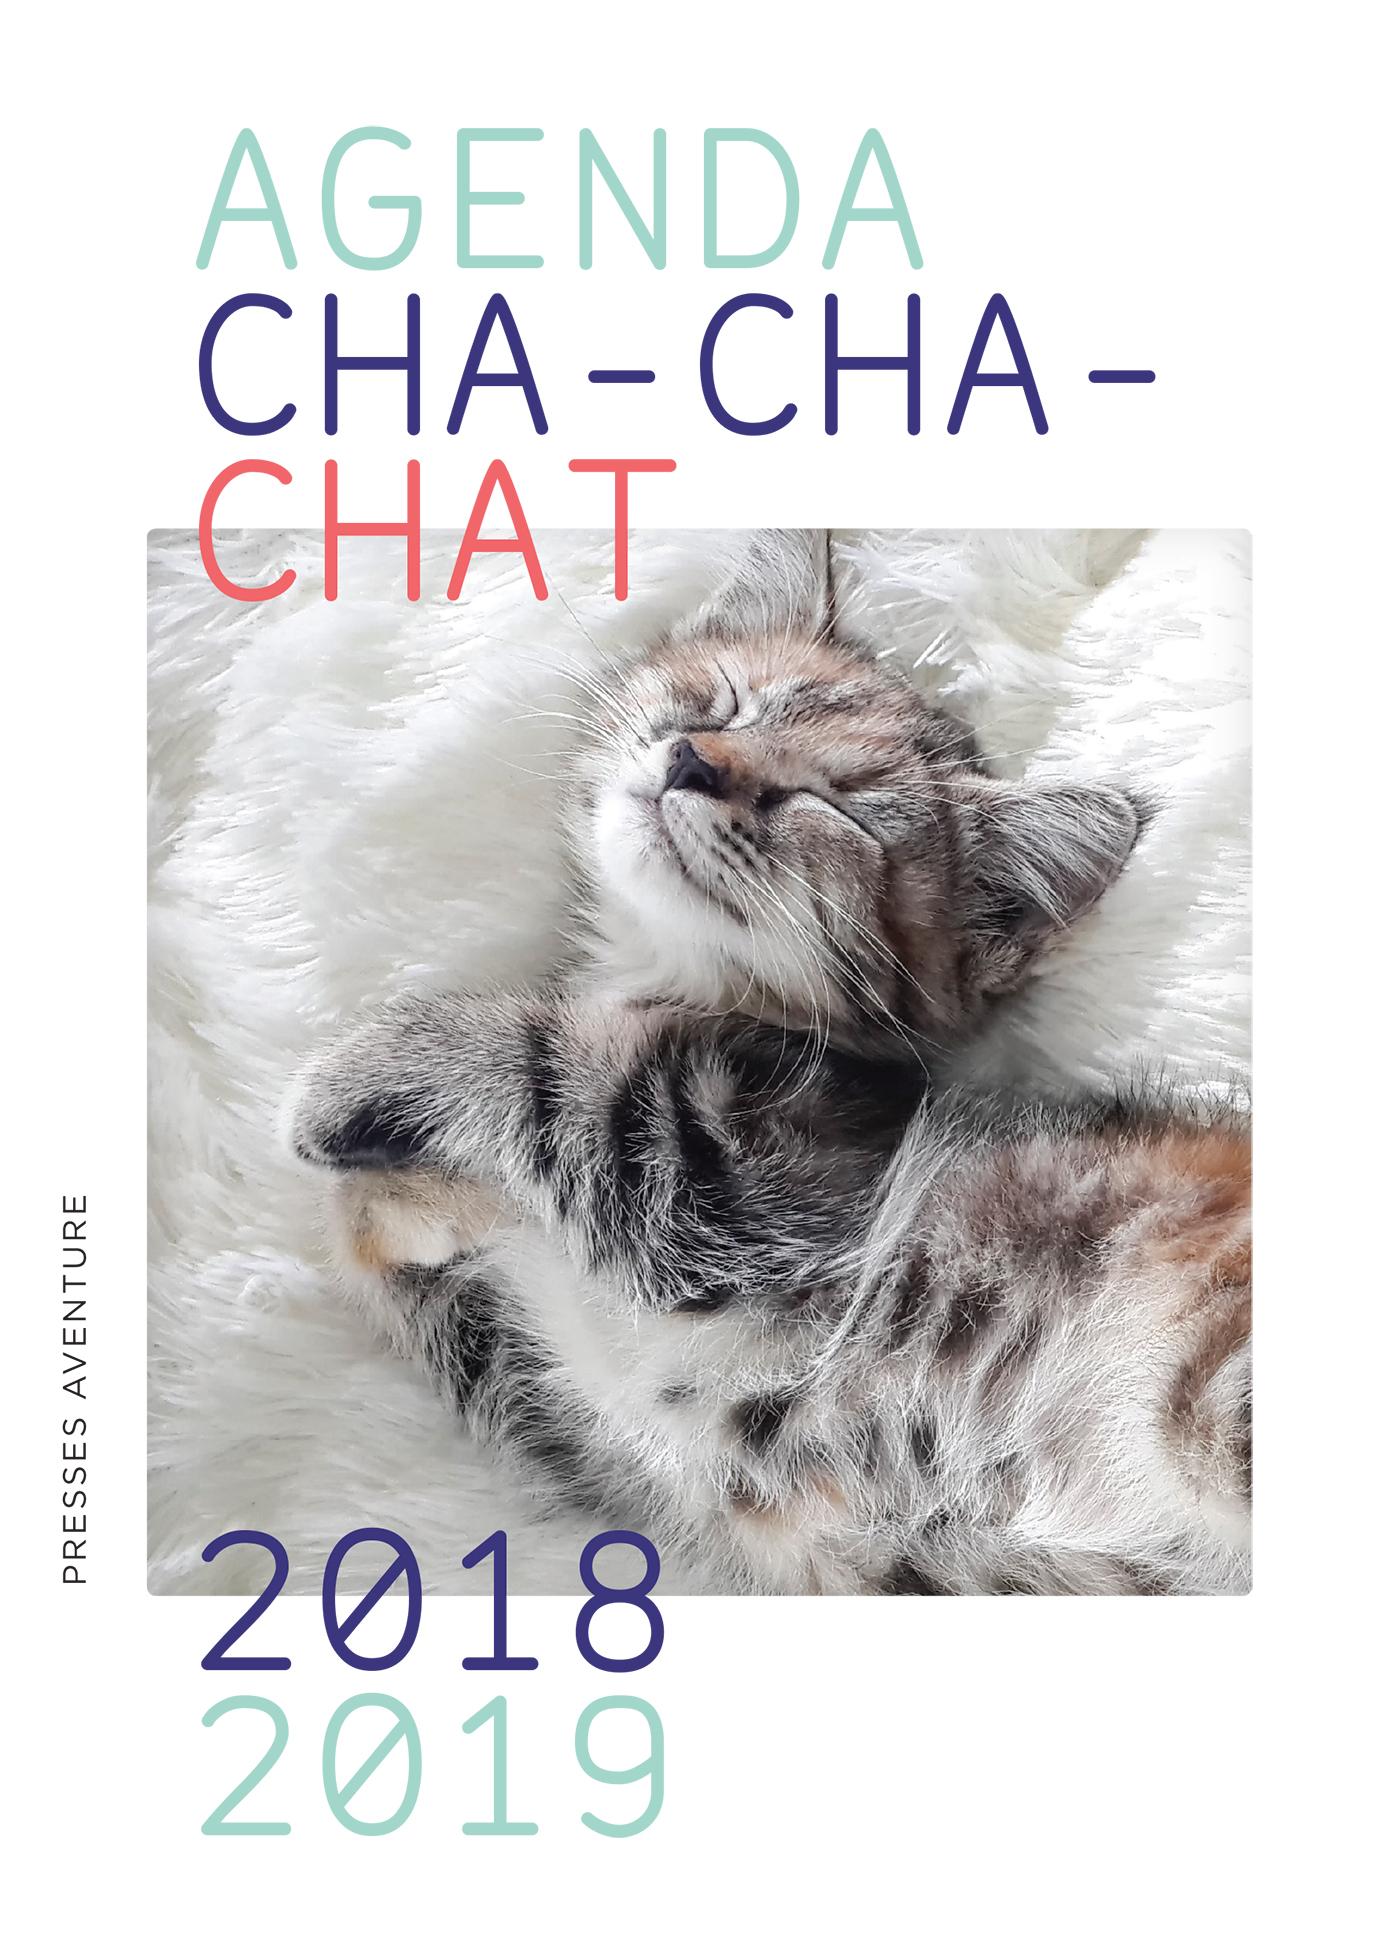 463_AgendaChachachat_C1